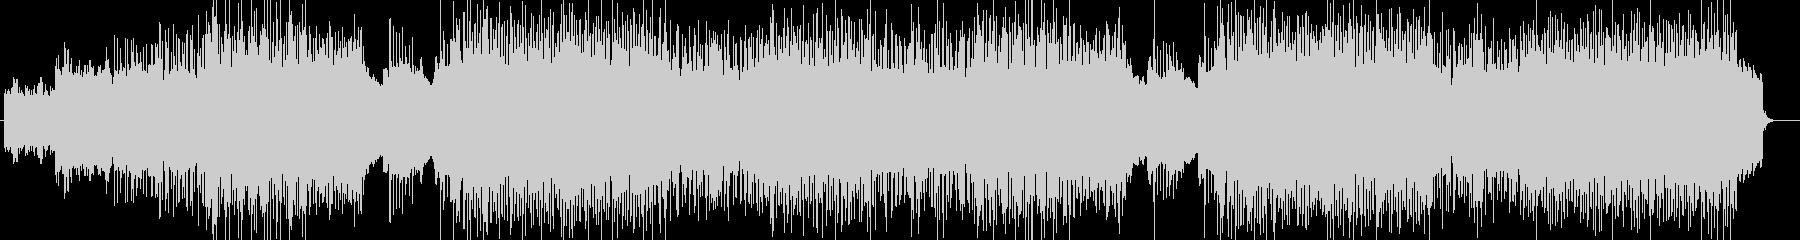 「HR/HM」「DARK」BGM197の未再生の波形